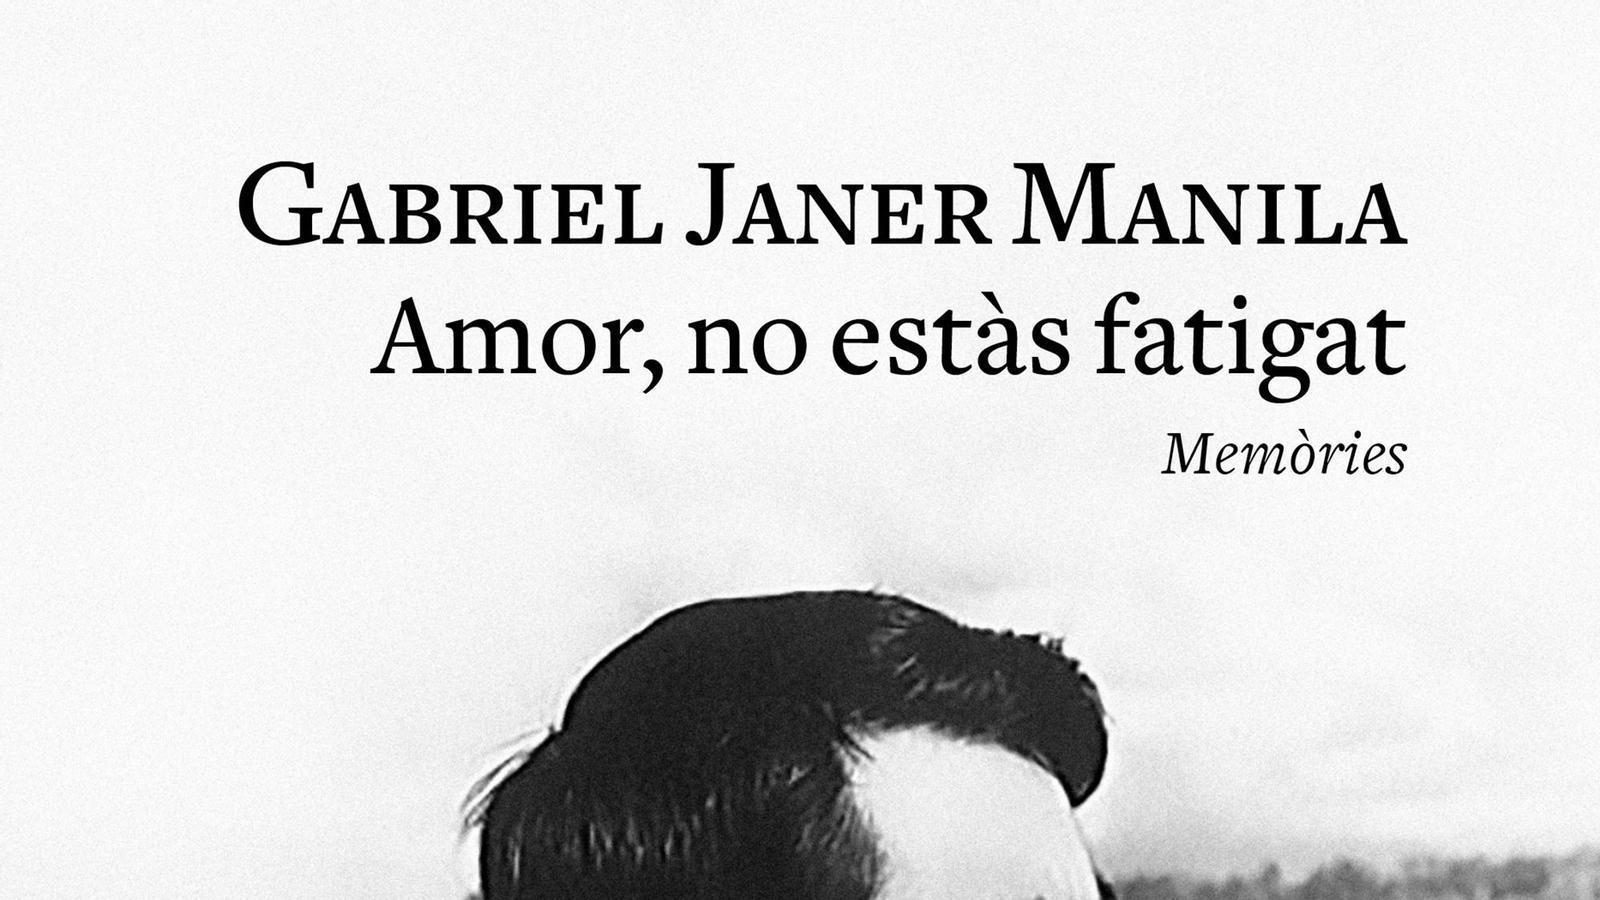 Les memòries de Janer Manila